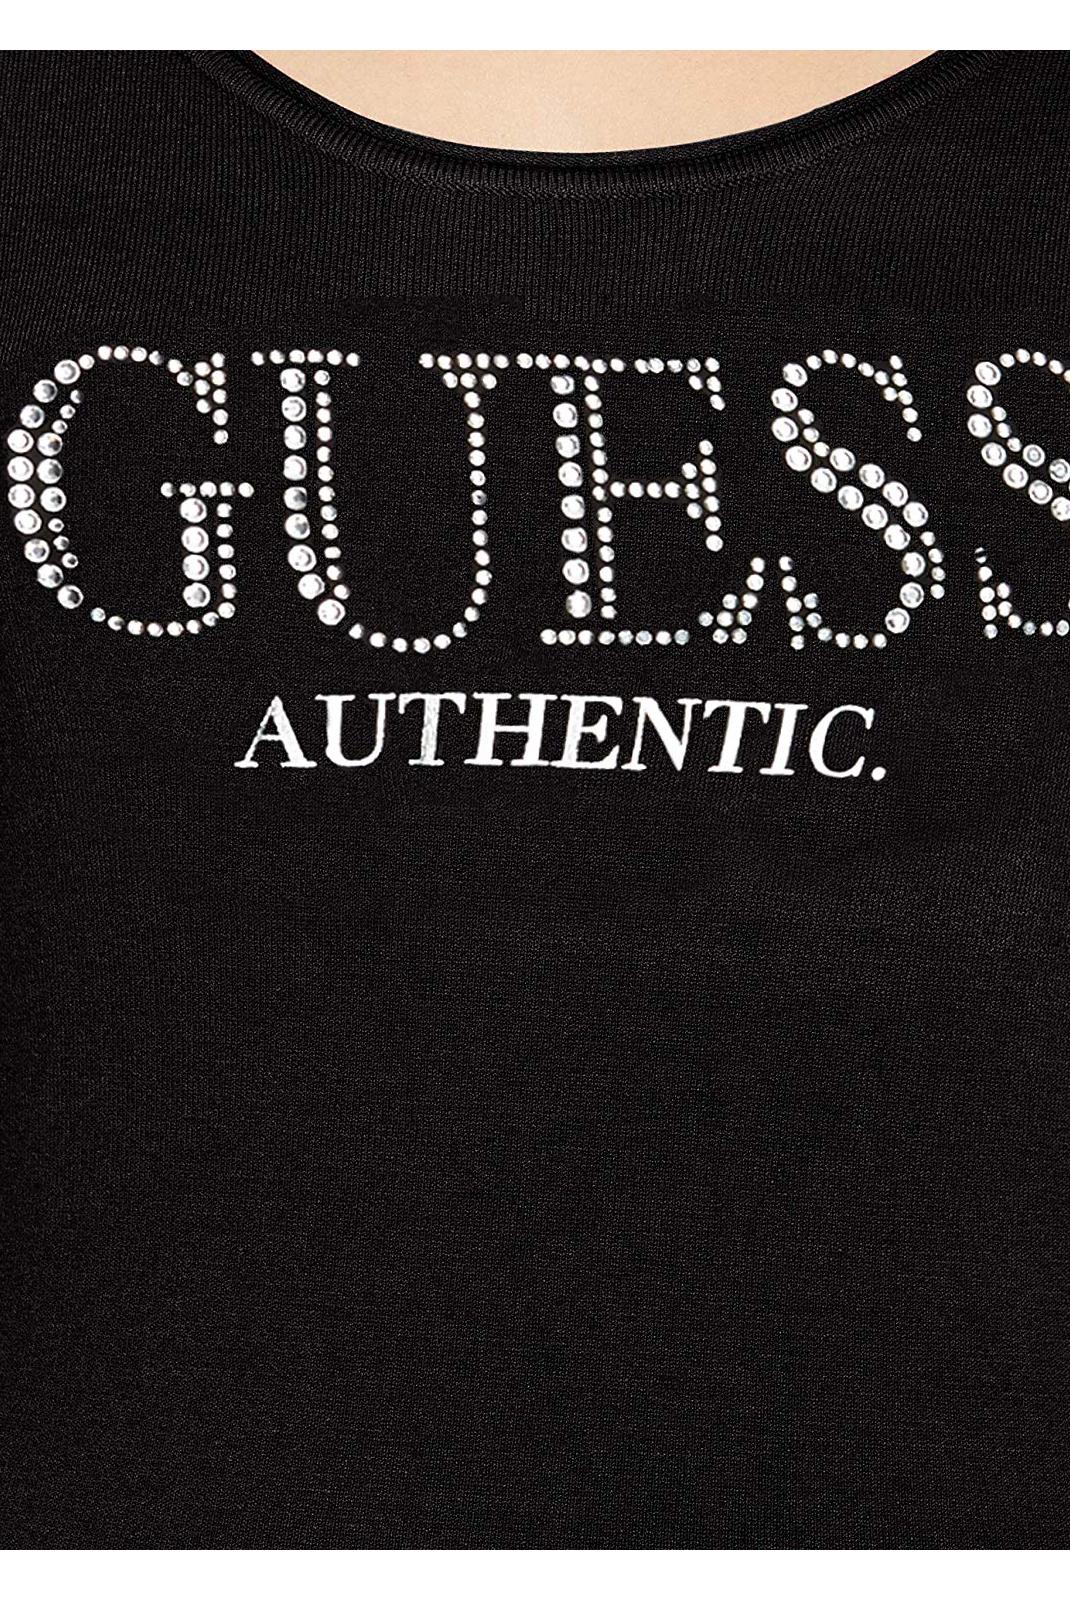 Pull  Guess jeans W91R58 Z2760 Jet Black A996